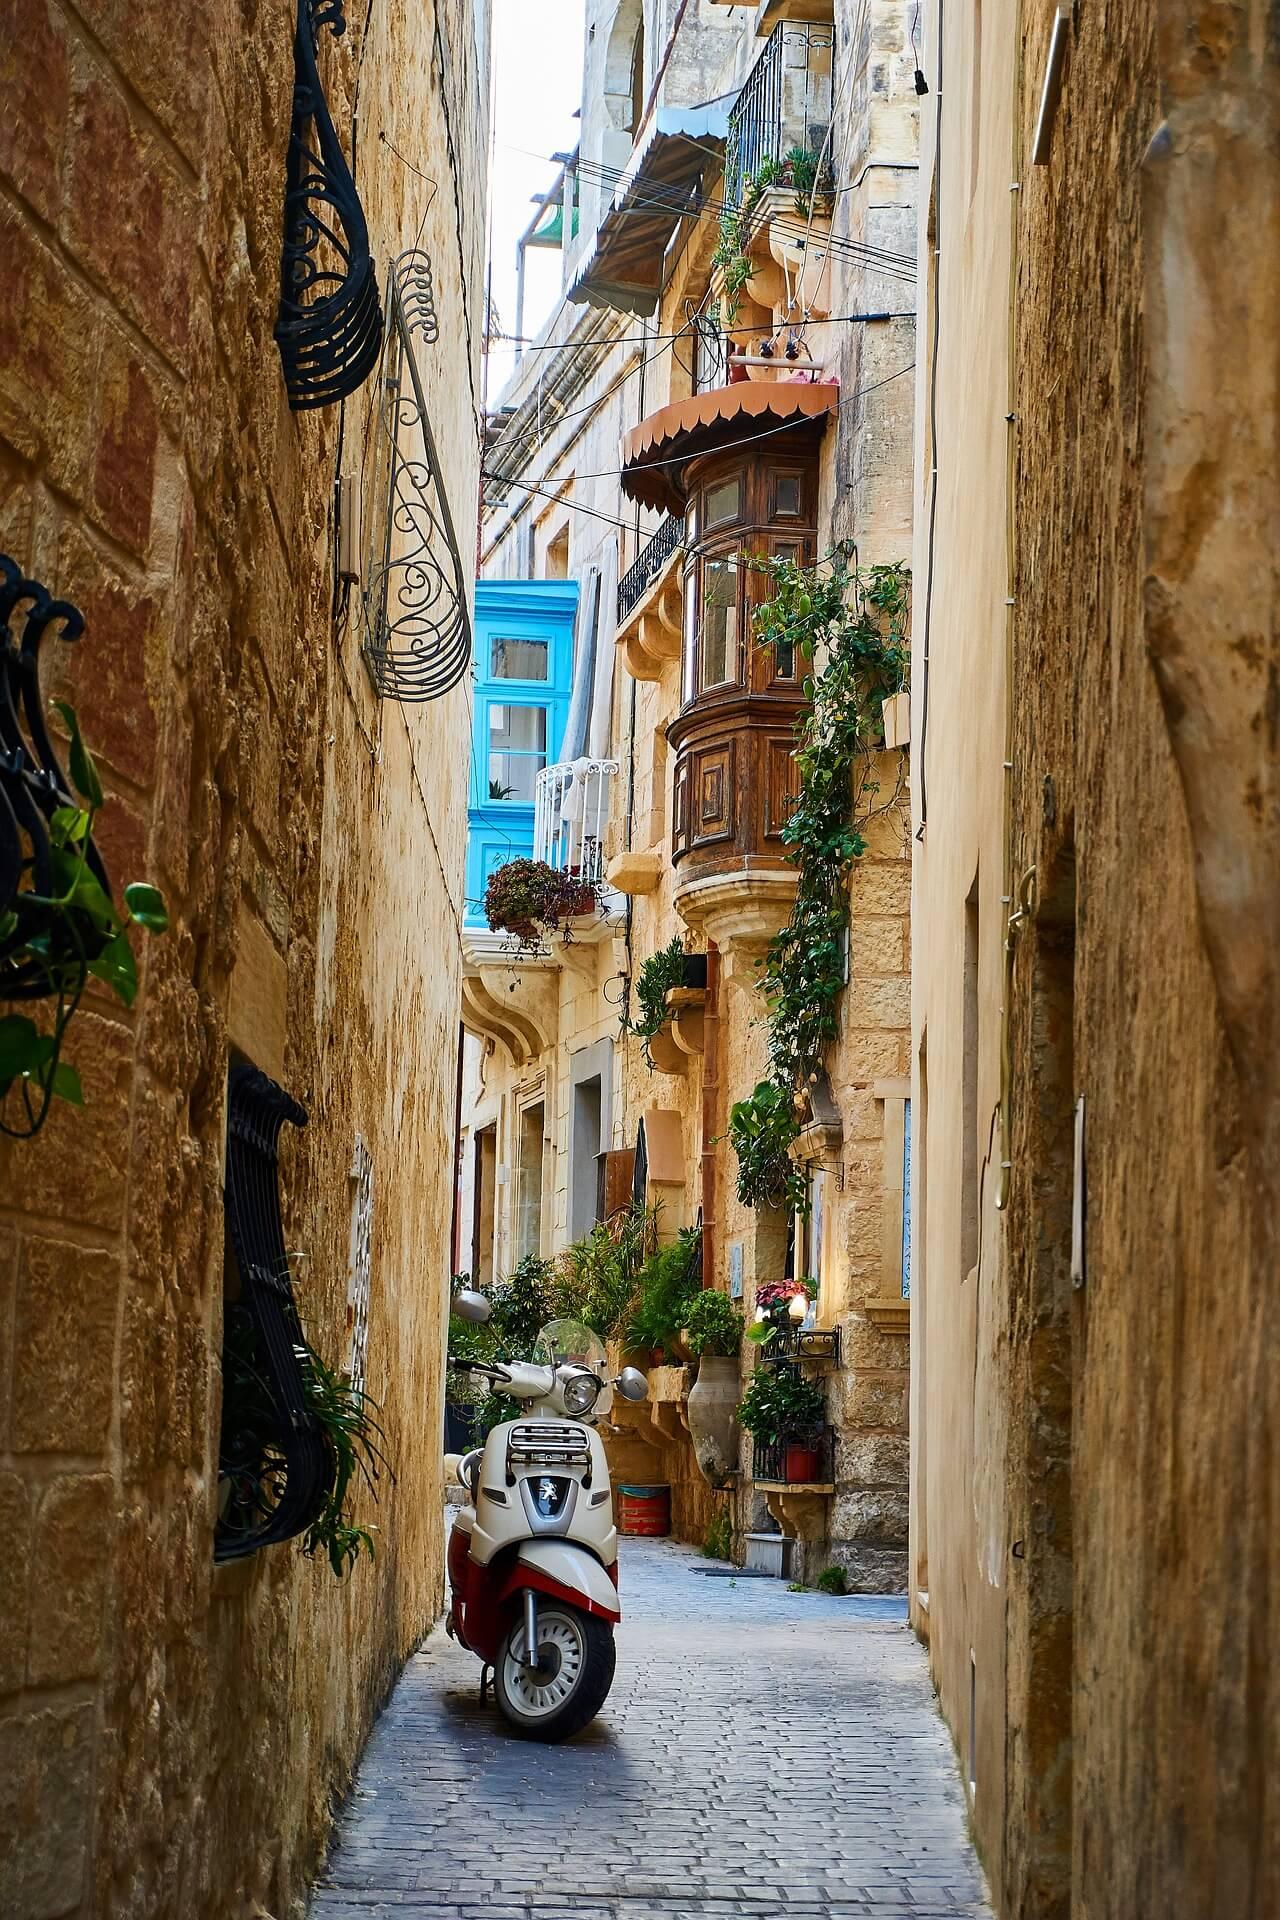 Rental Car in Malta 2